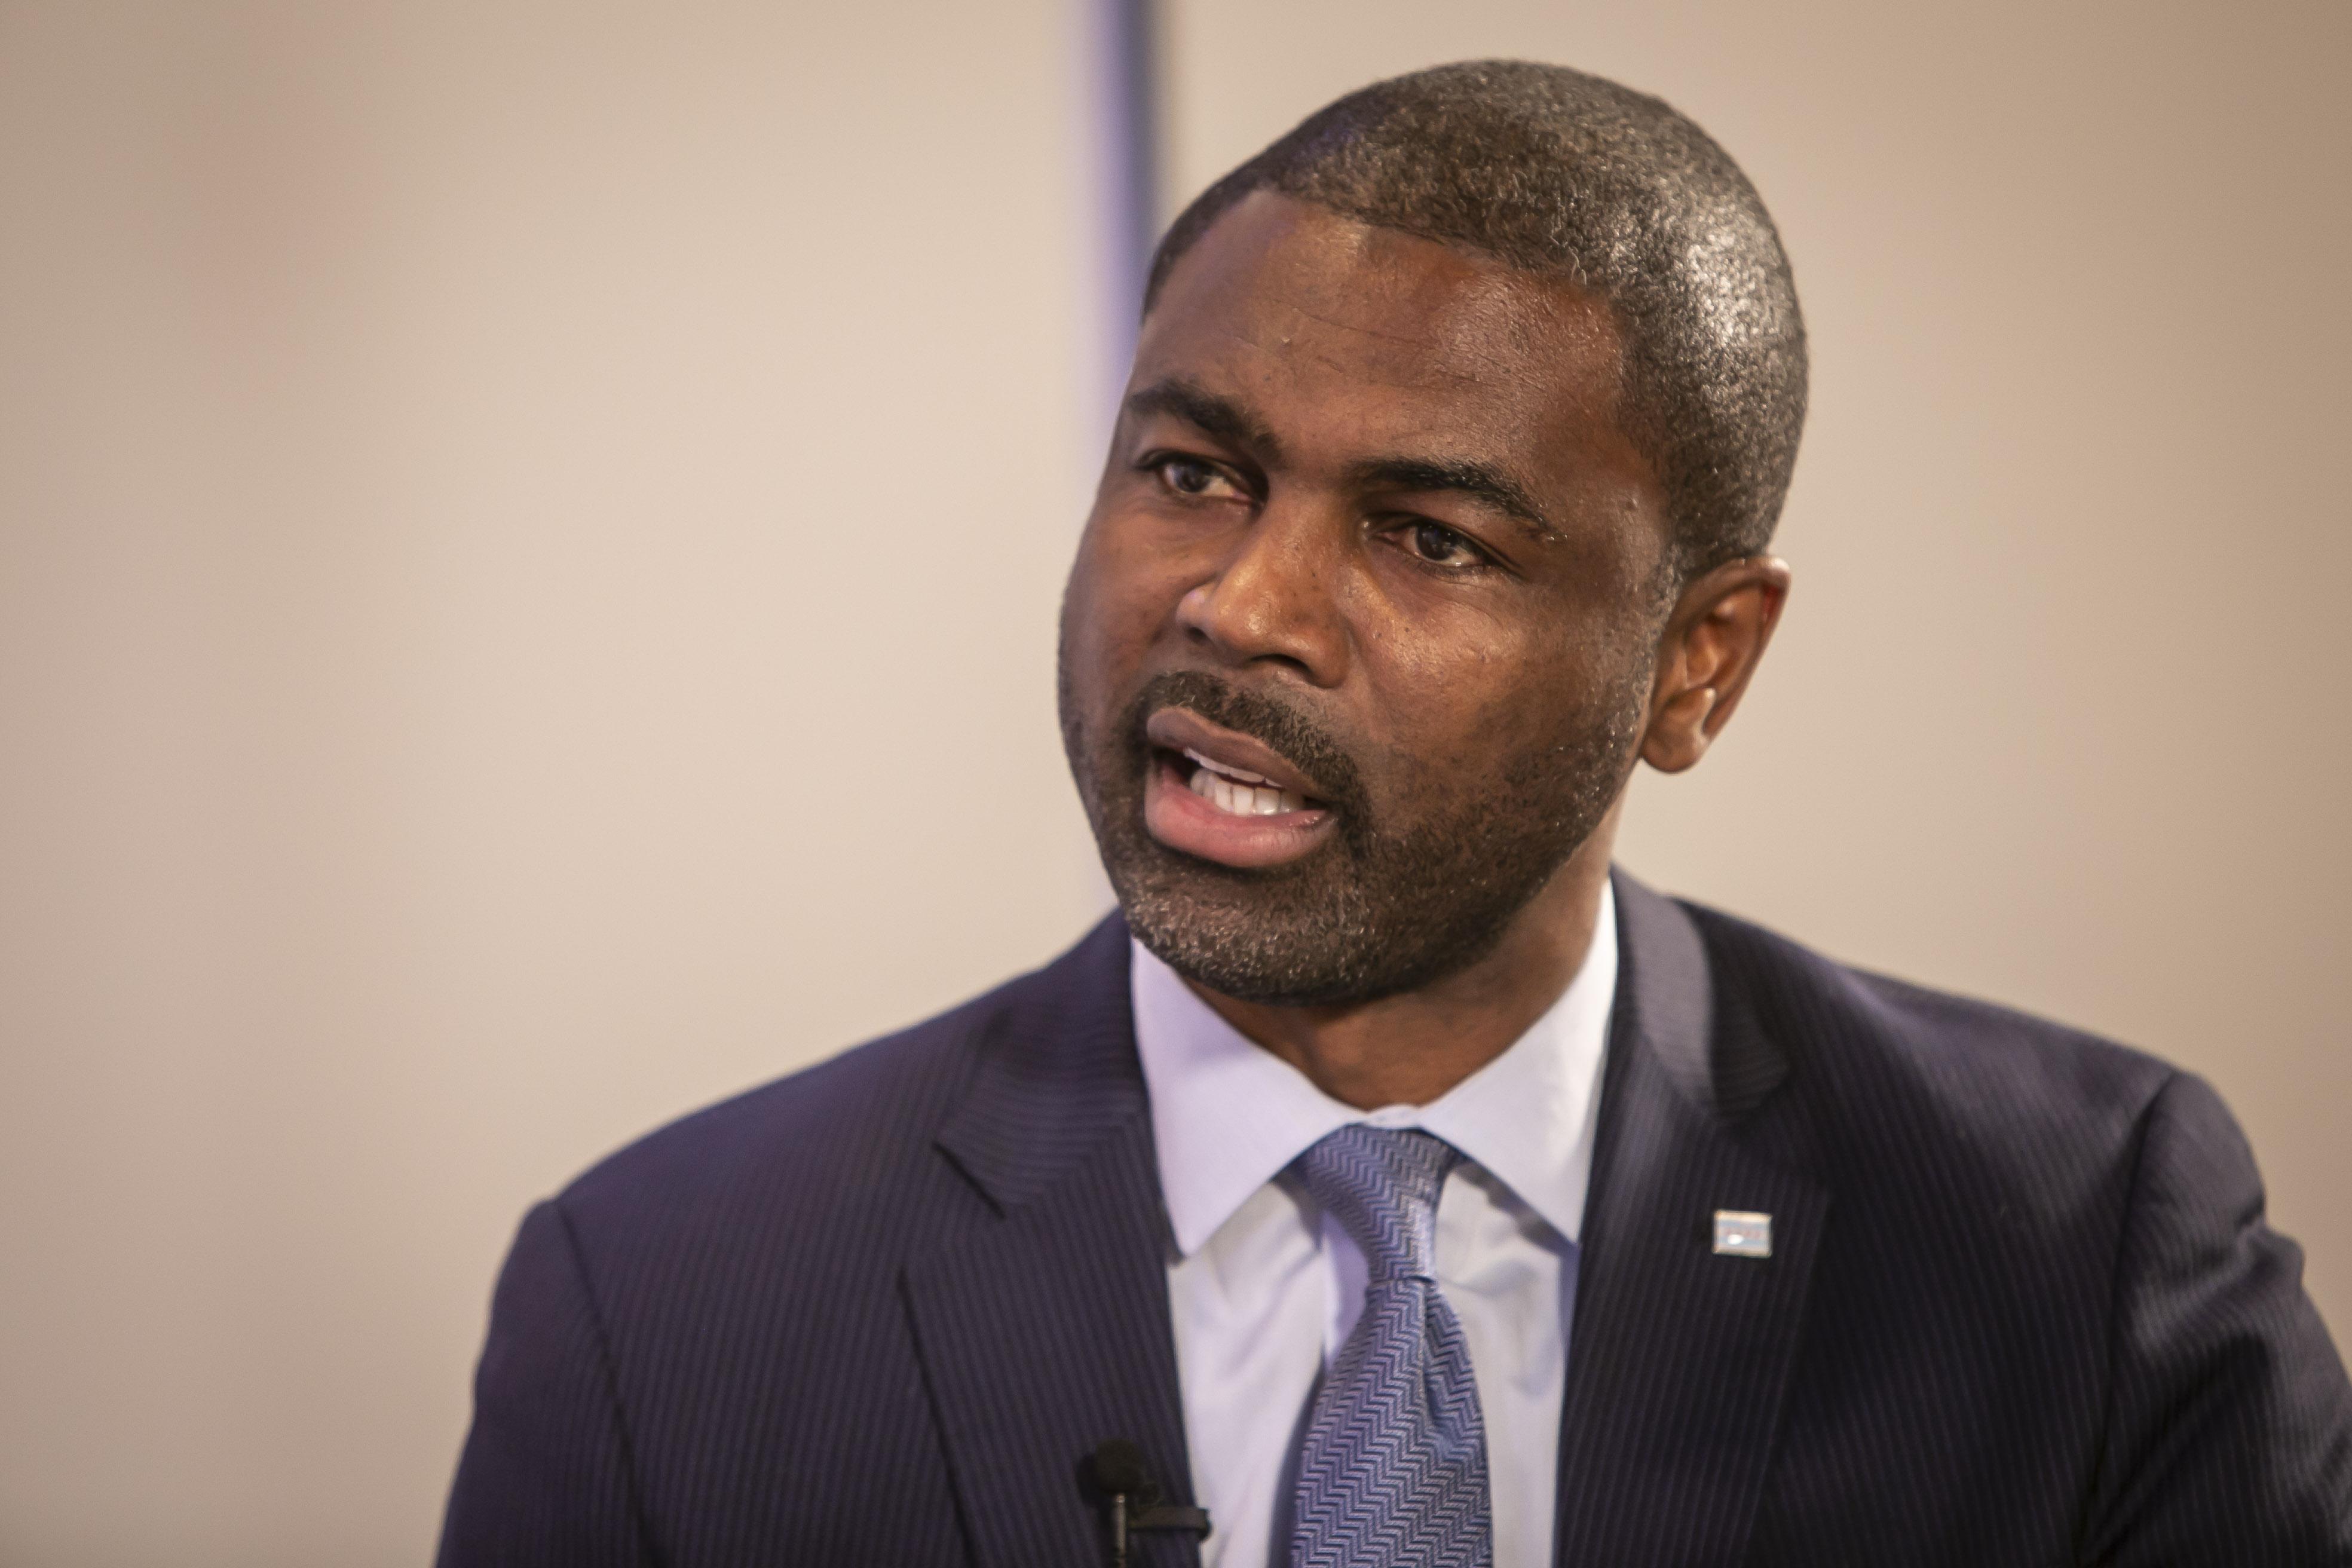 State Rep. La Shawn Ford in 2019.